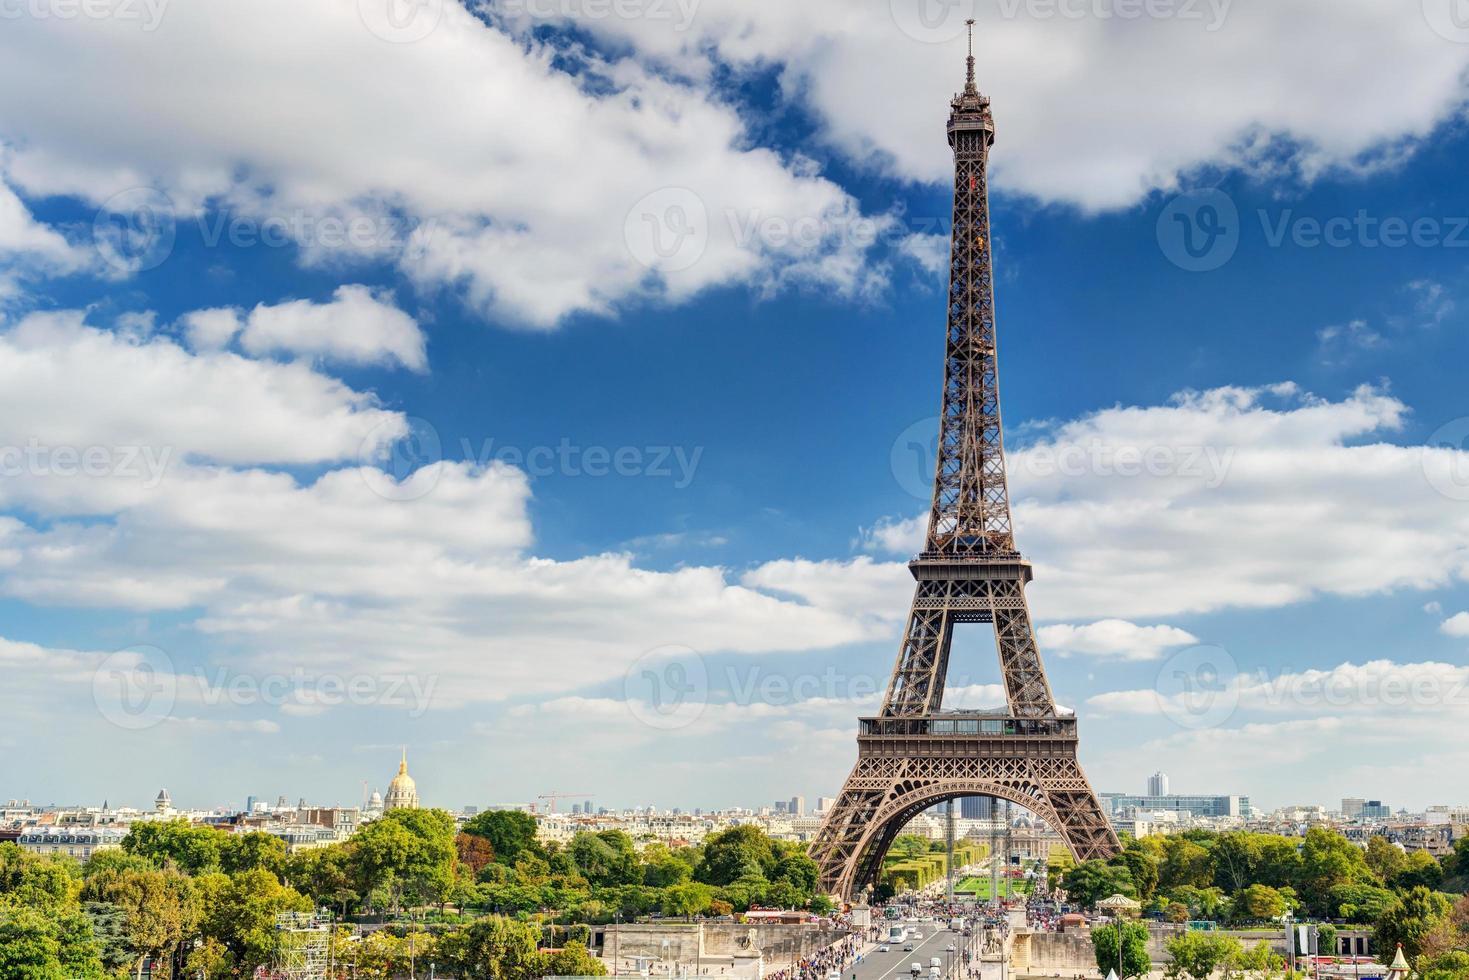 The Eiffel tower in Paris photo